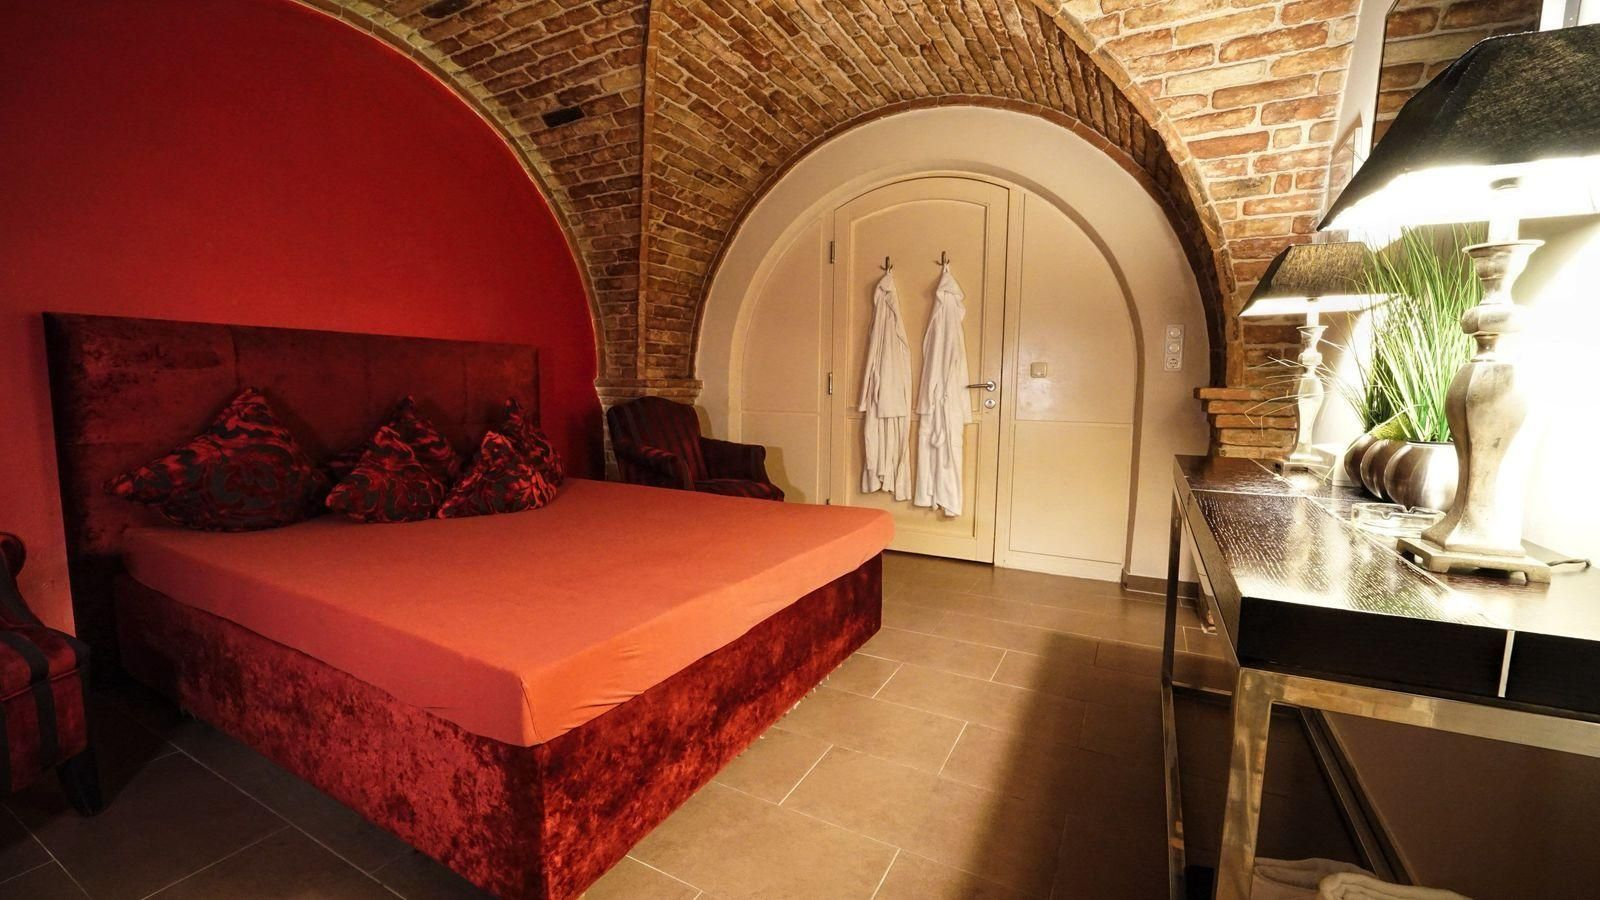 Zimmer2-Altbau-Bett-2bae5be5